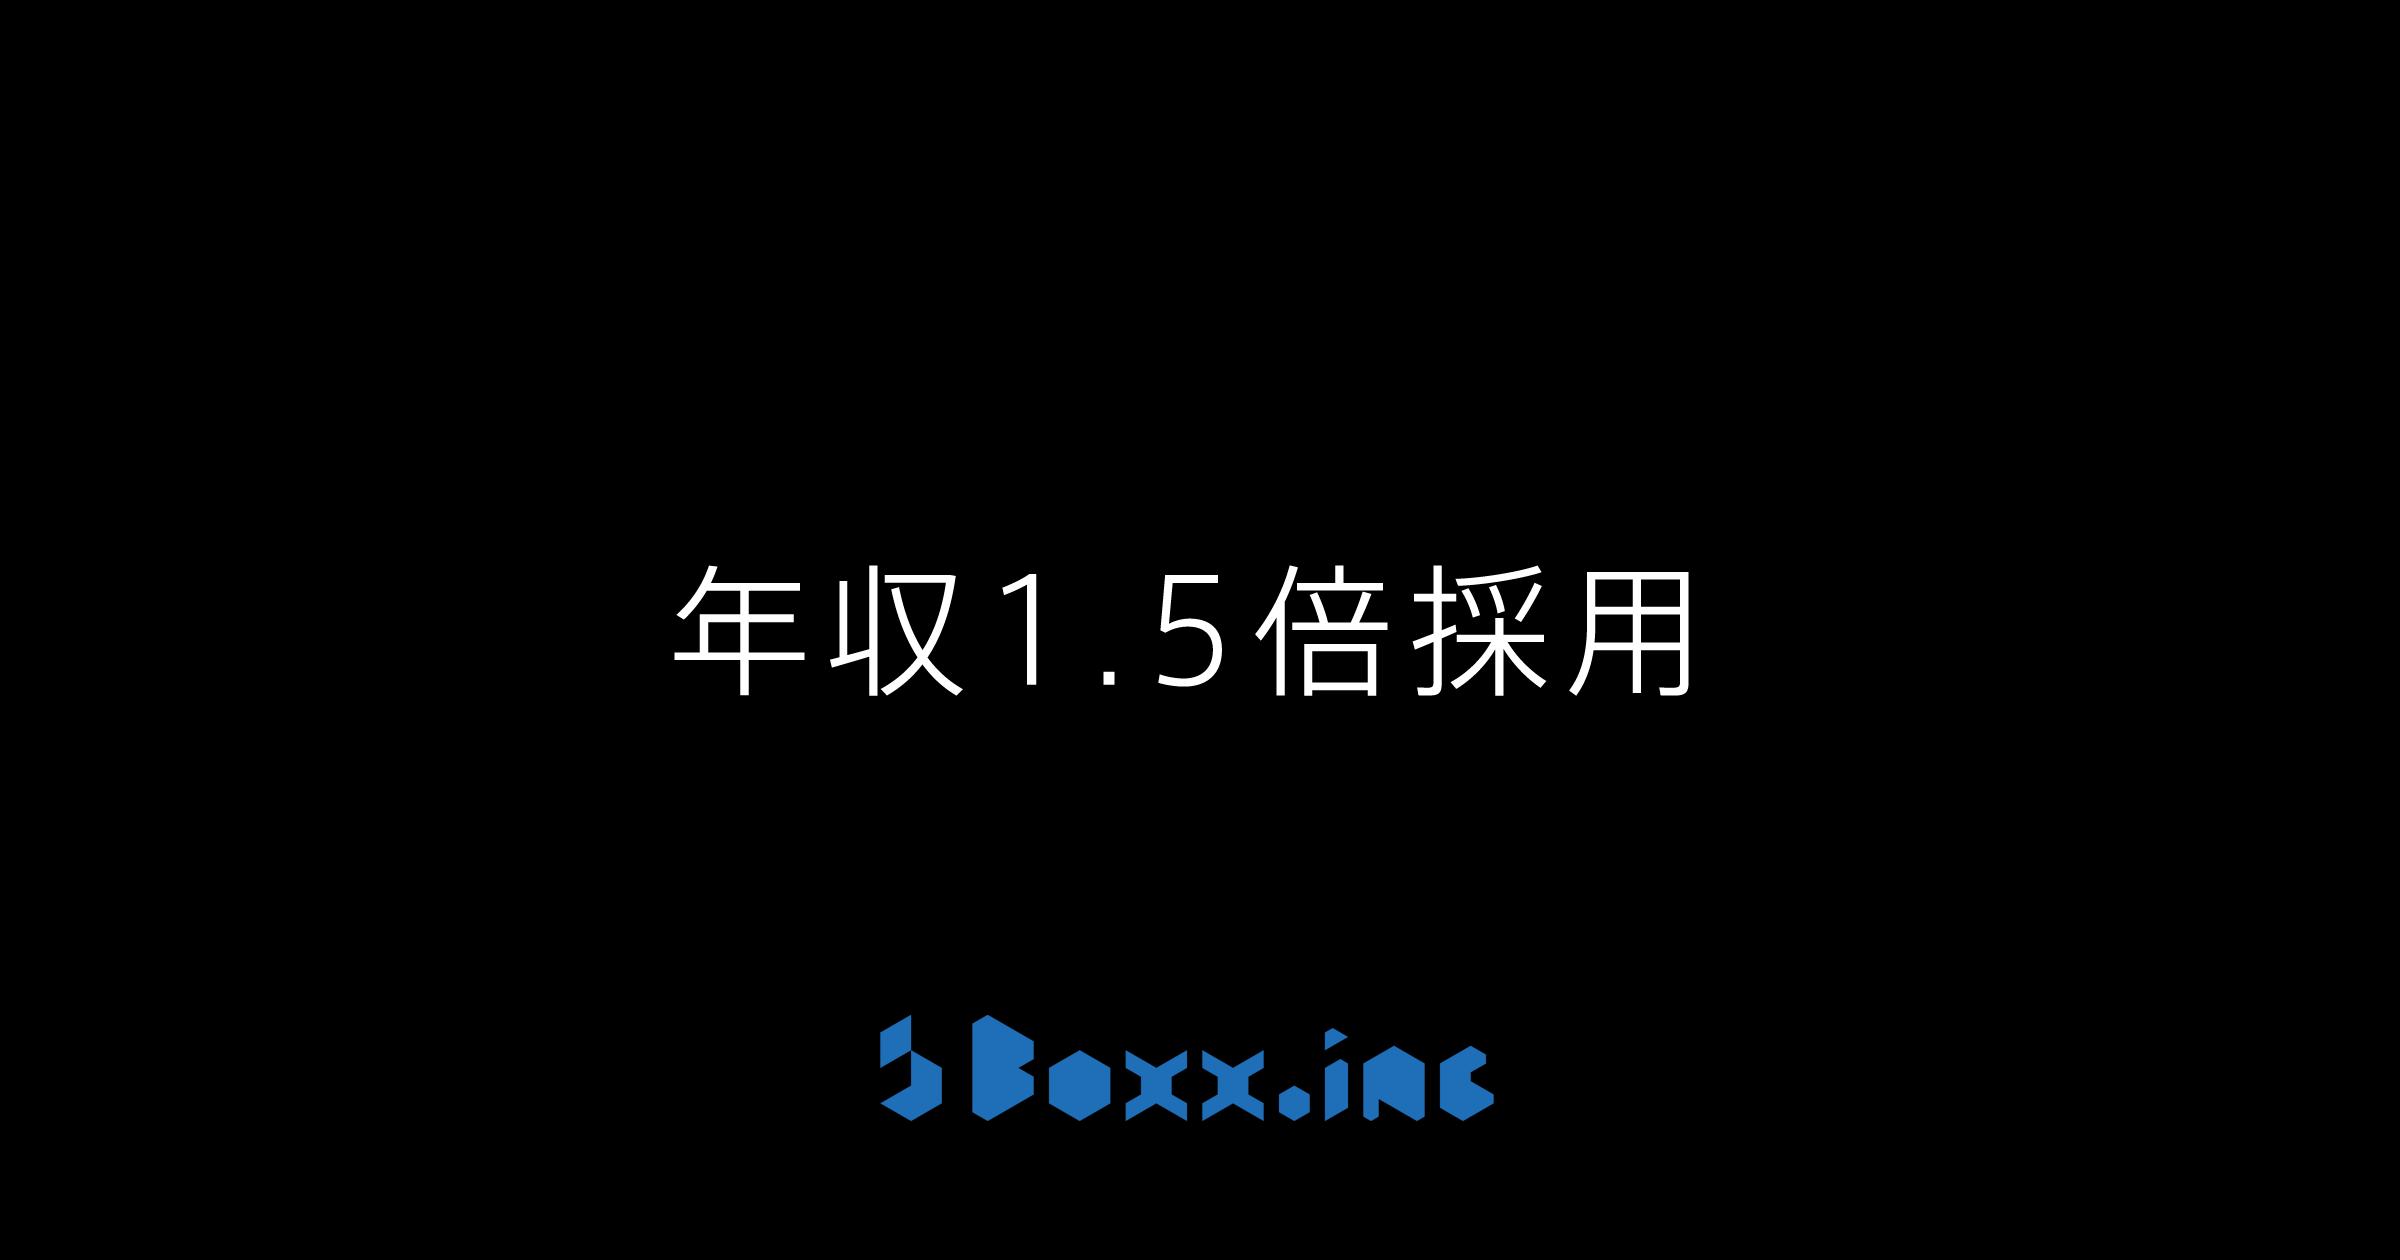 boxx jobs og h.png